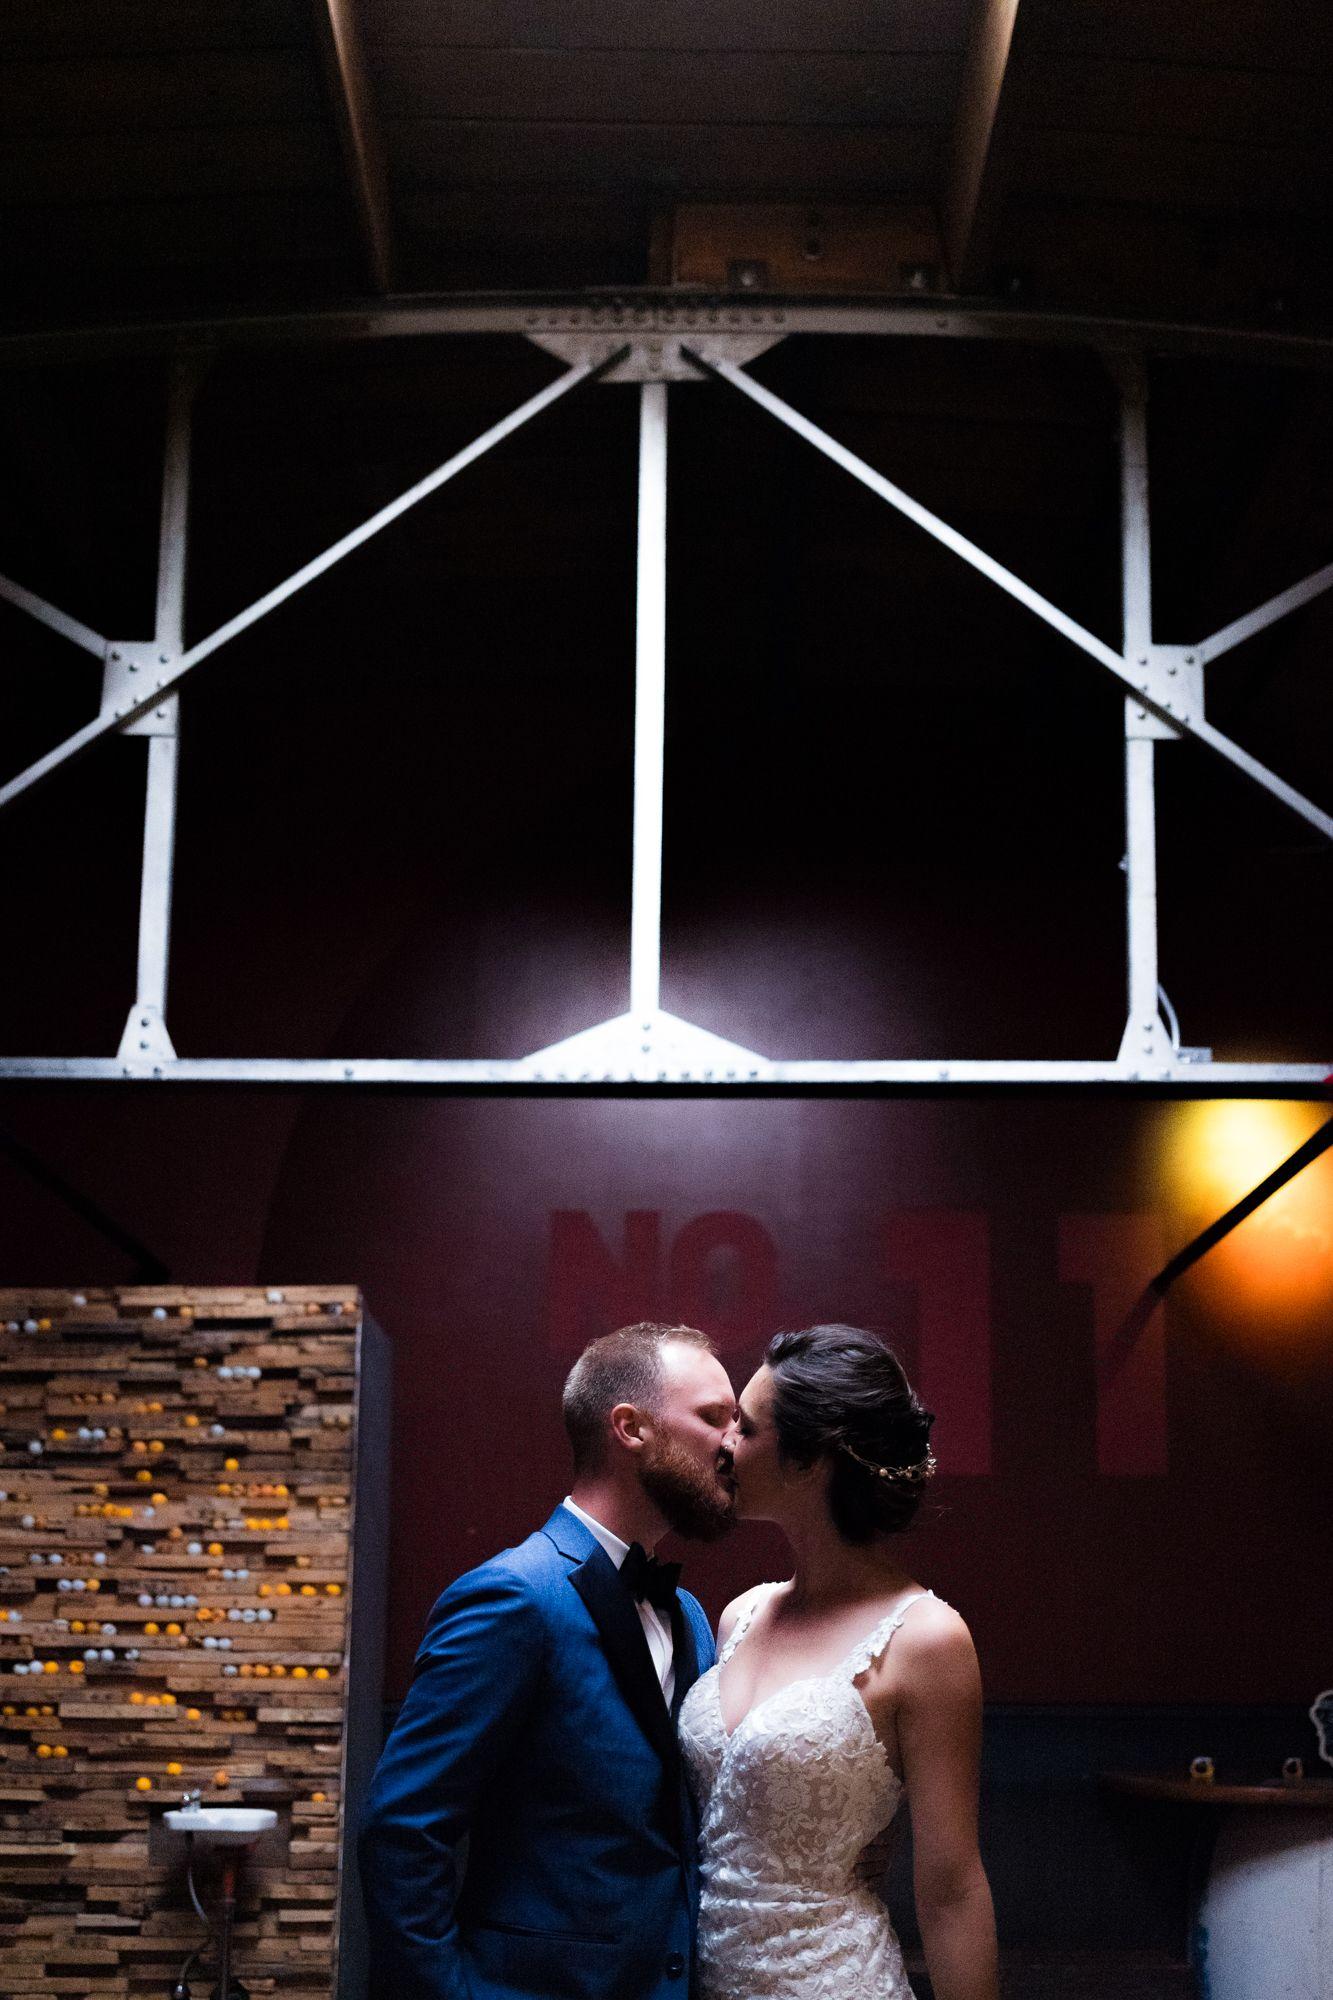 Denver Wedding Photographers Visit Our Site For More About Booking Denver Wedding Photography Denver Wedding Photographer Wedding Photographers